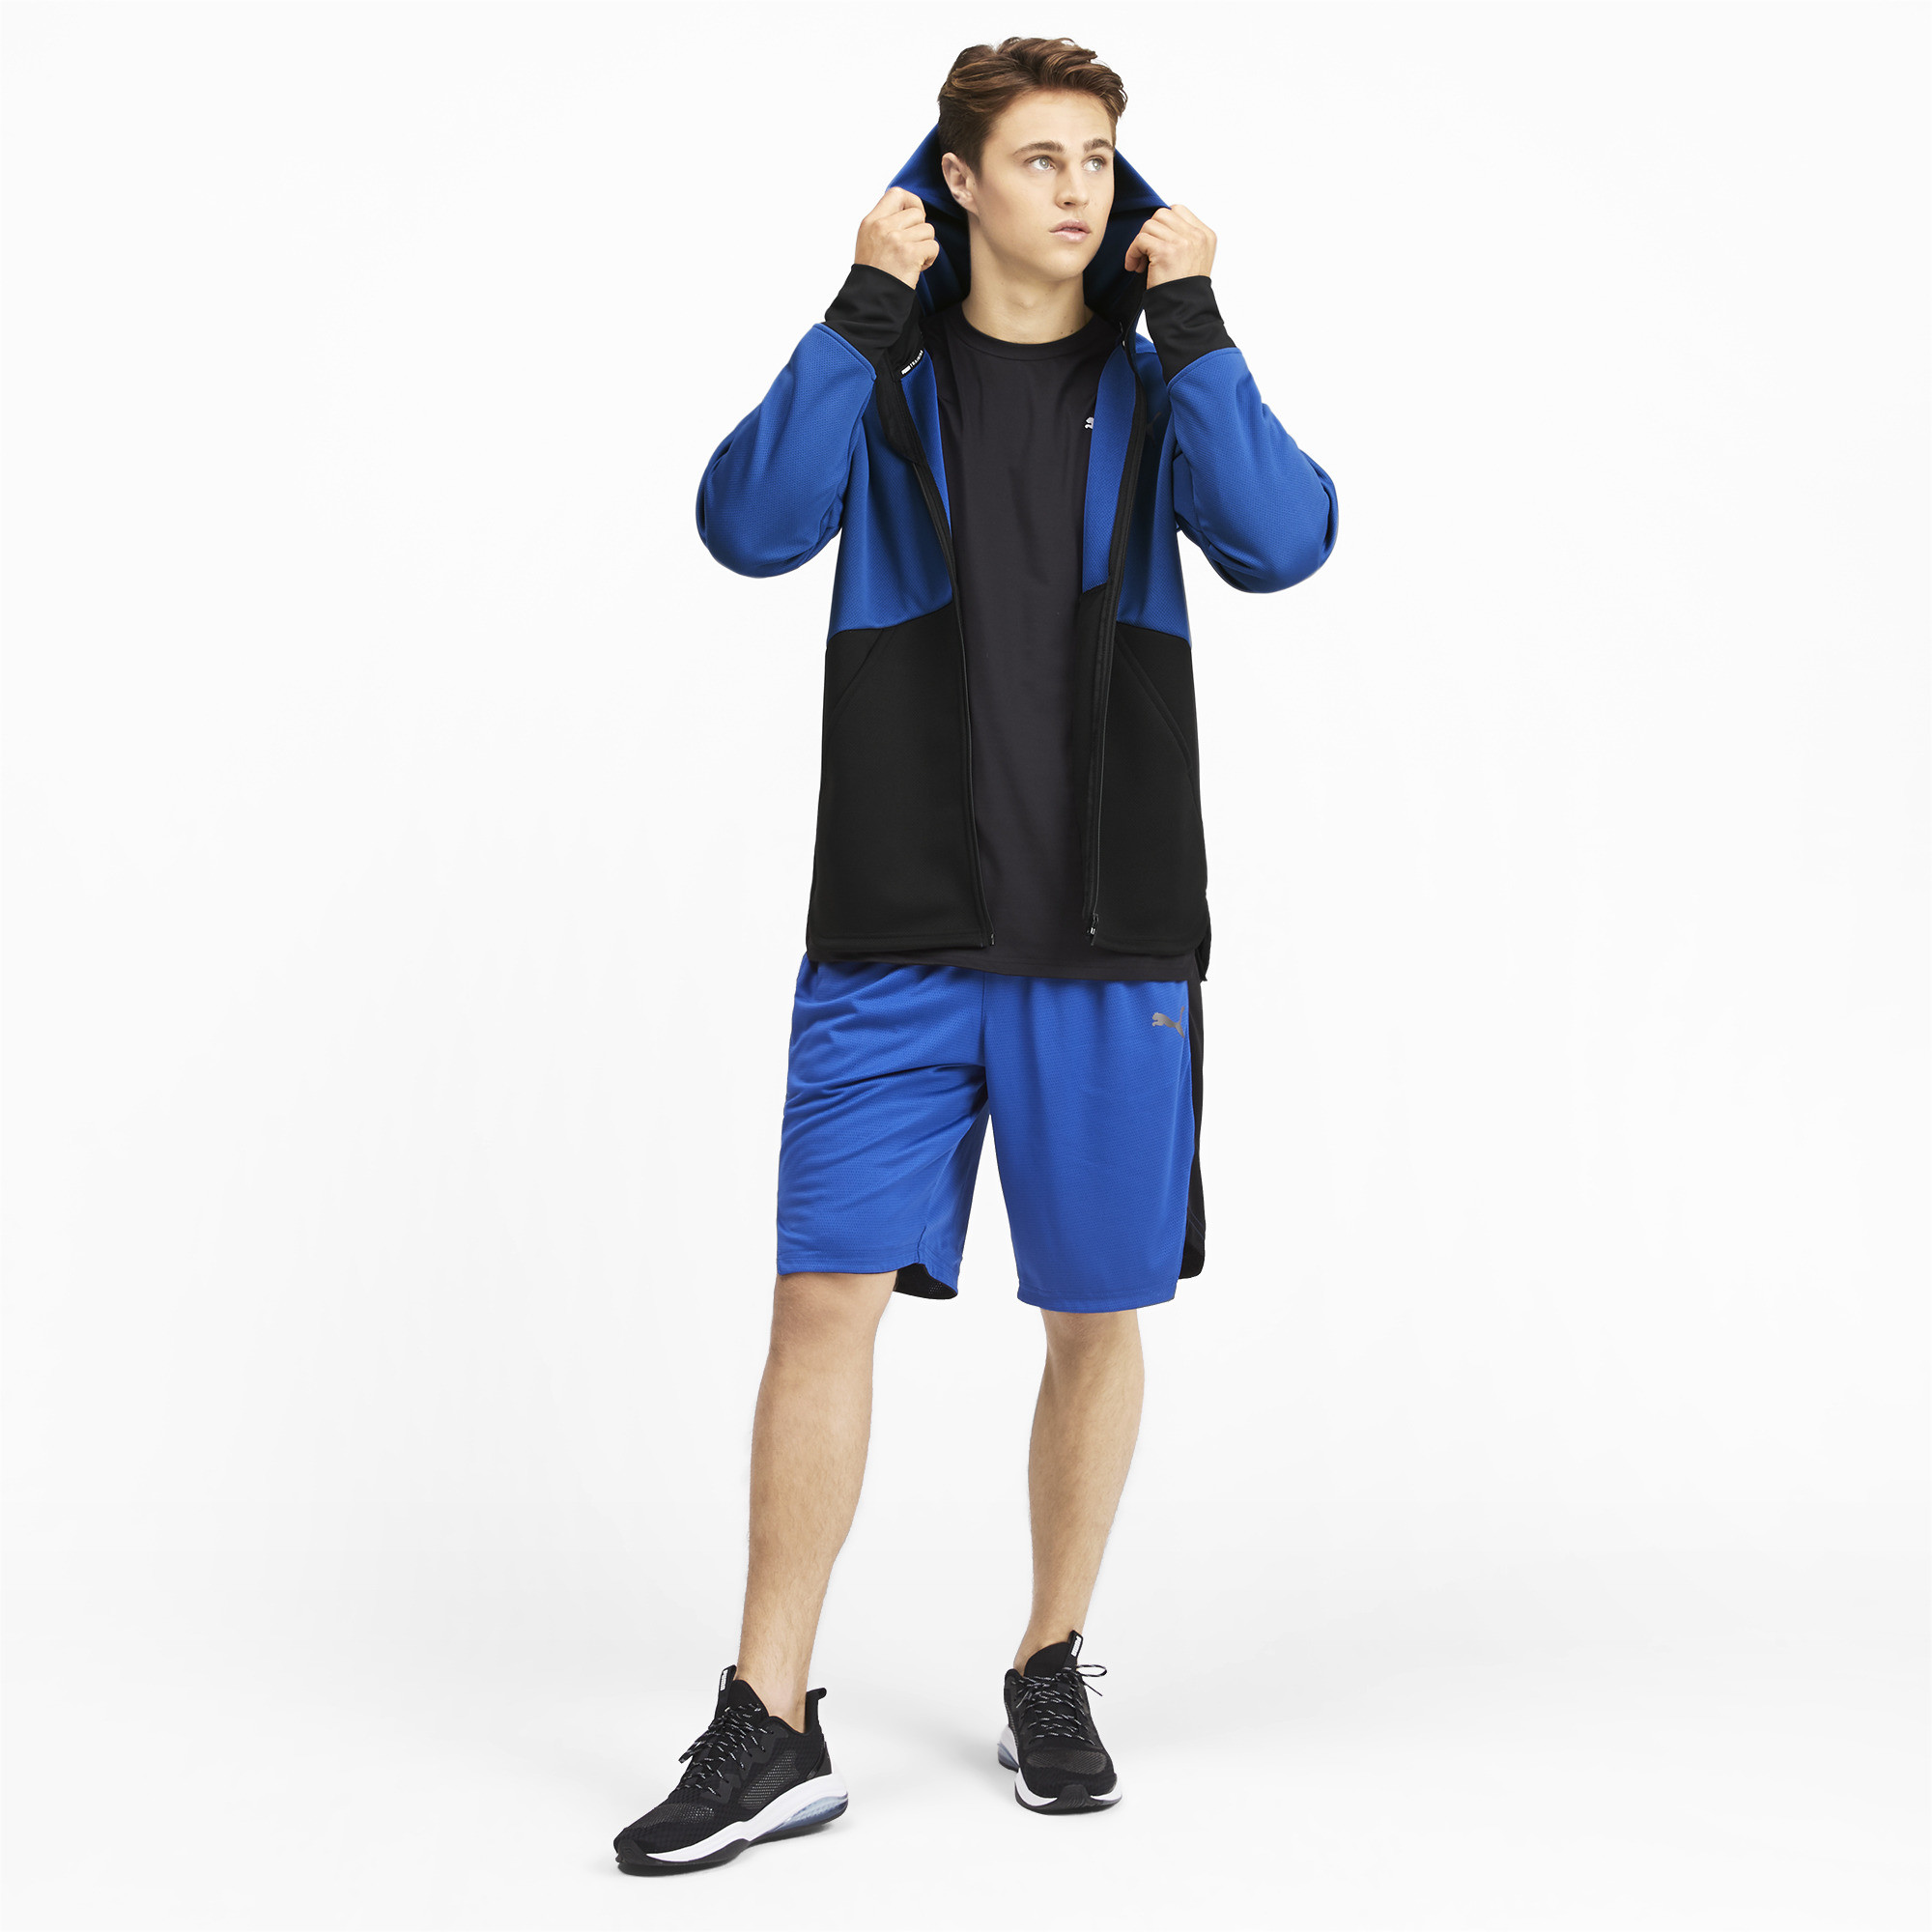 PUMA-Power-BND-Men-039-s-Jacket-Men-Knitted-Jacket-Training thumbnail 6